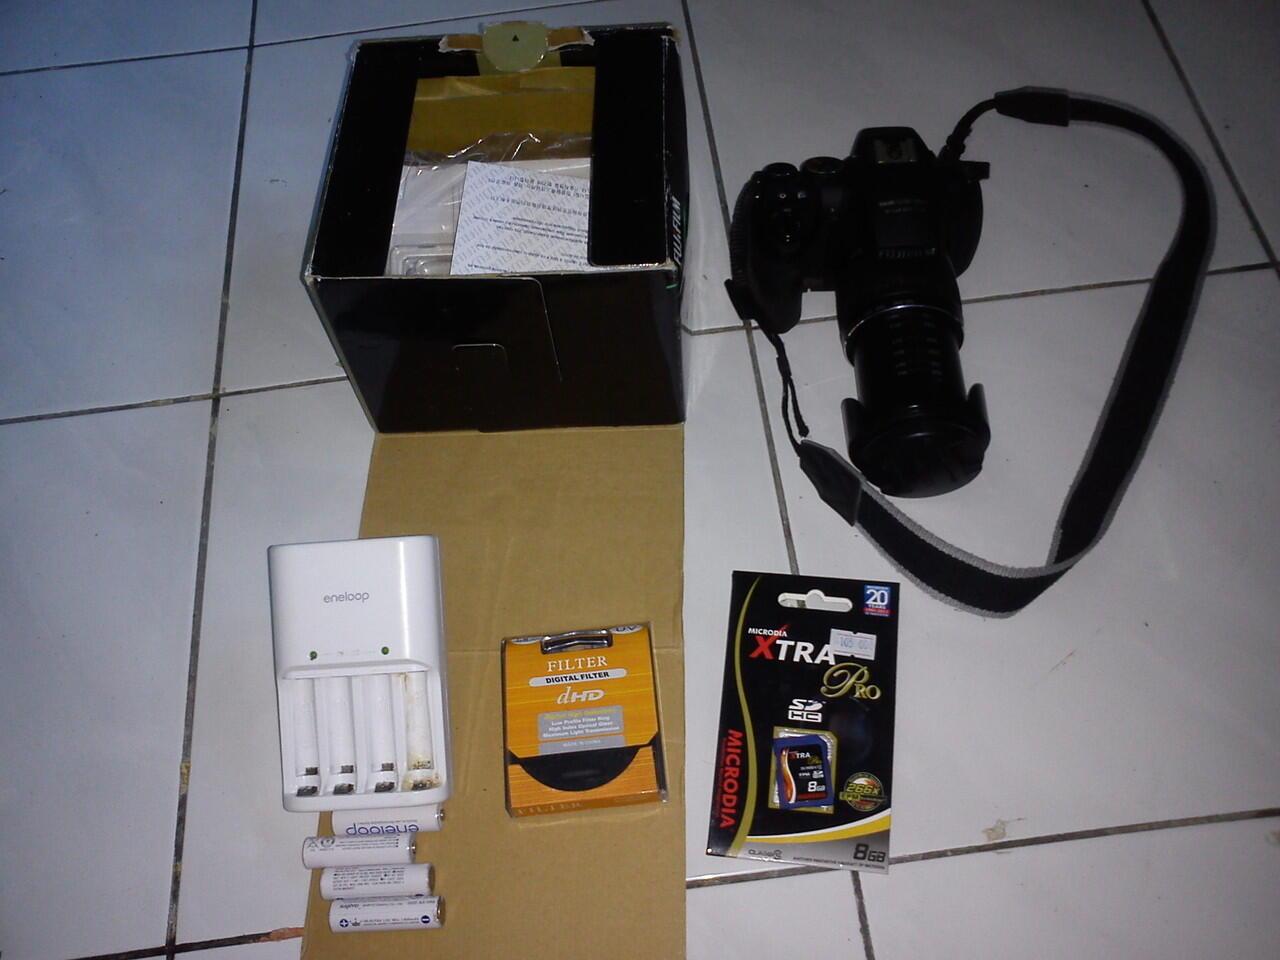 Kamera semi DSLR prosumer, fujifilm finepix hs20exr 24-720mm lens banyak bonus